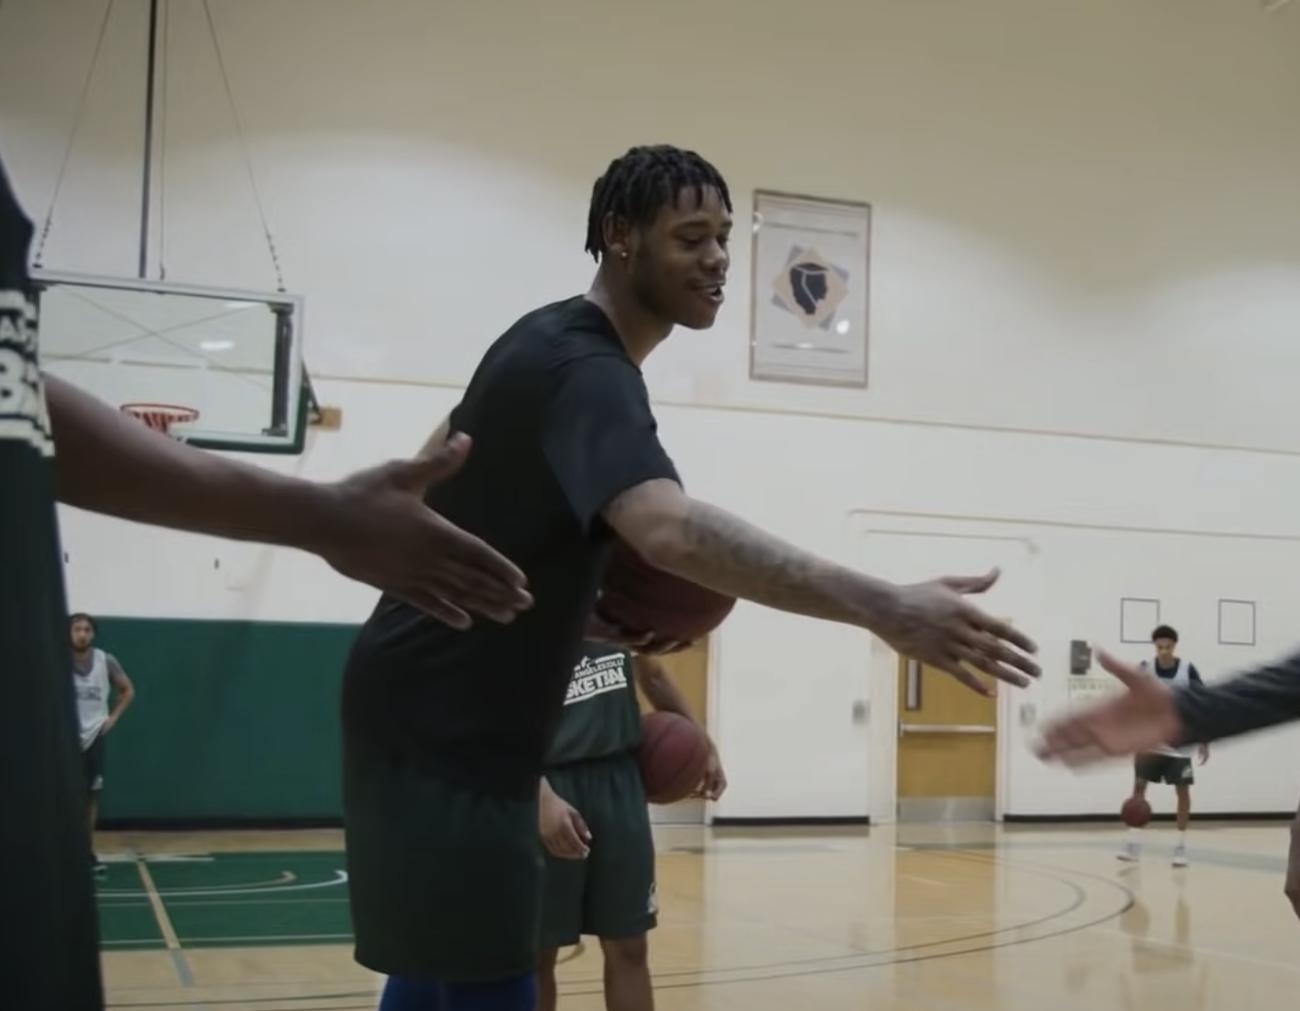 Joe Hampton shakes his coach's hand while filming Last Chance U Basketball